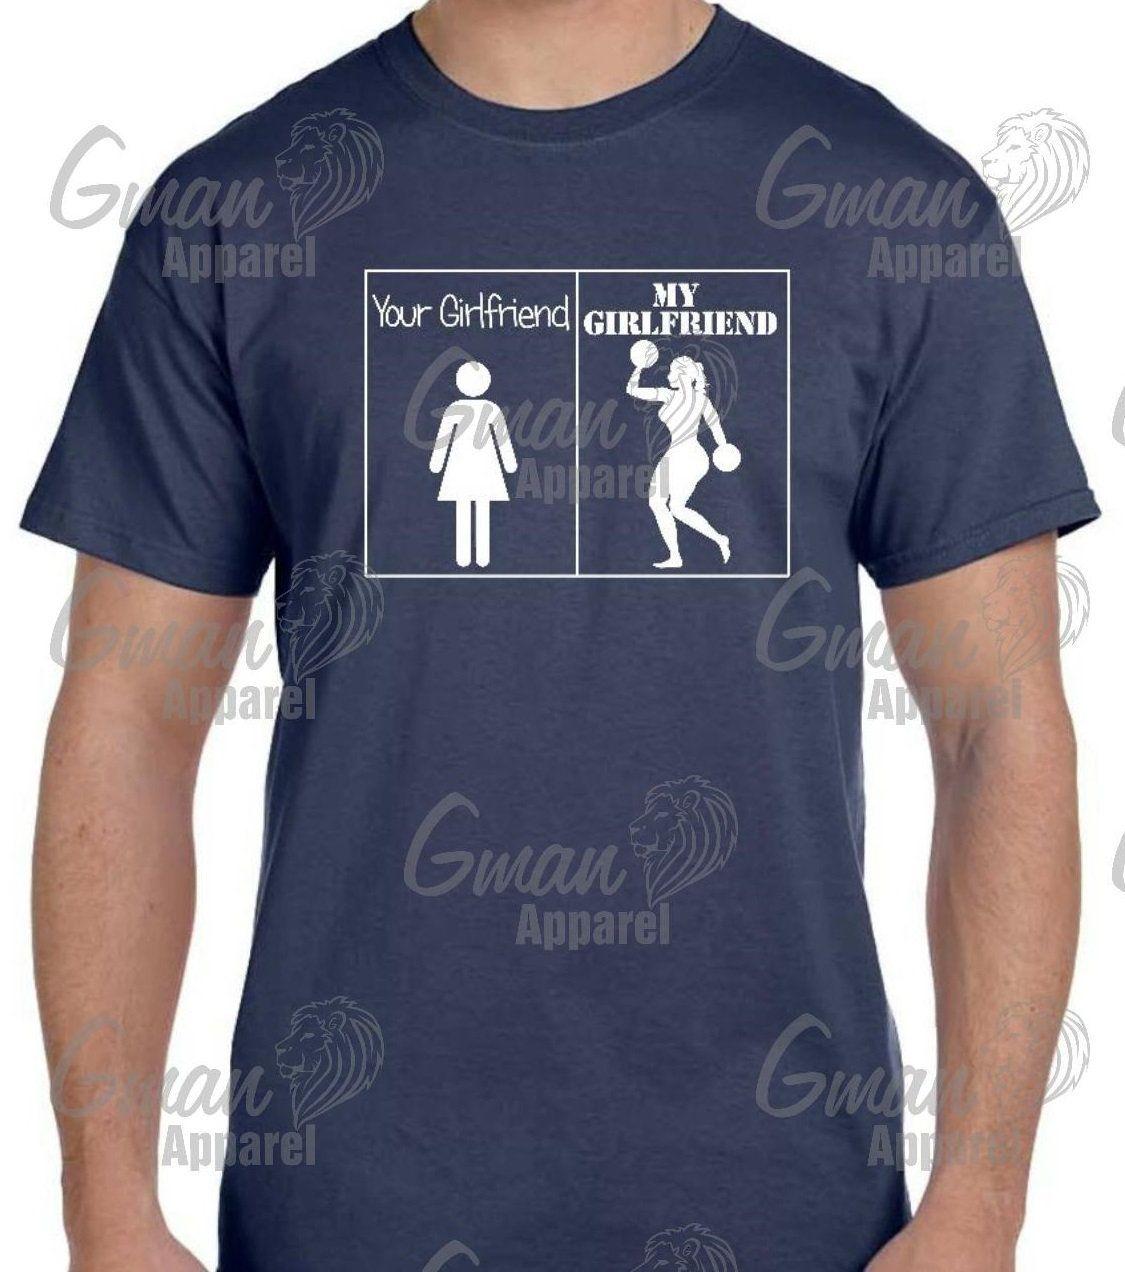 Funny gym tshirt your girlfriend vs my girlfriend size s